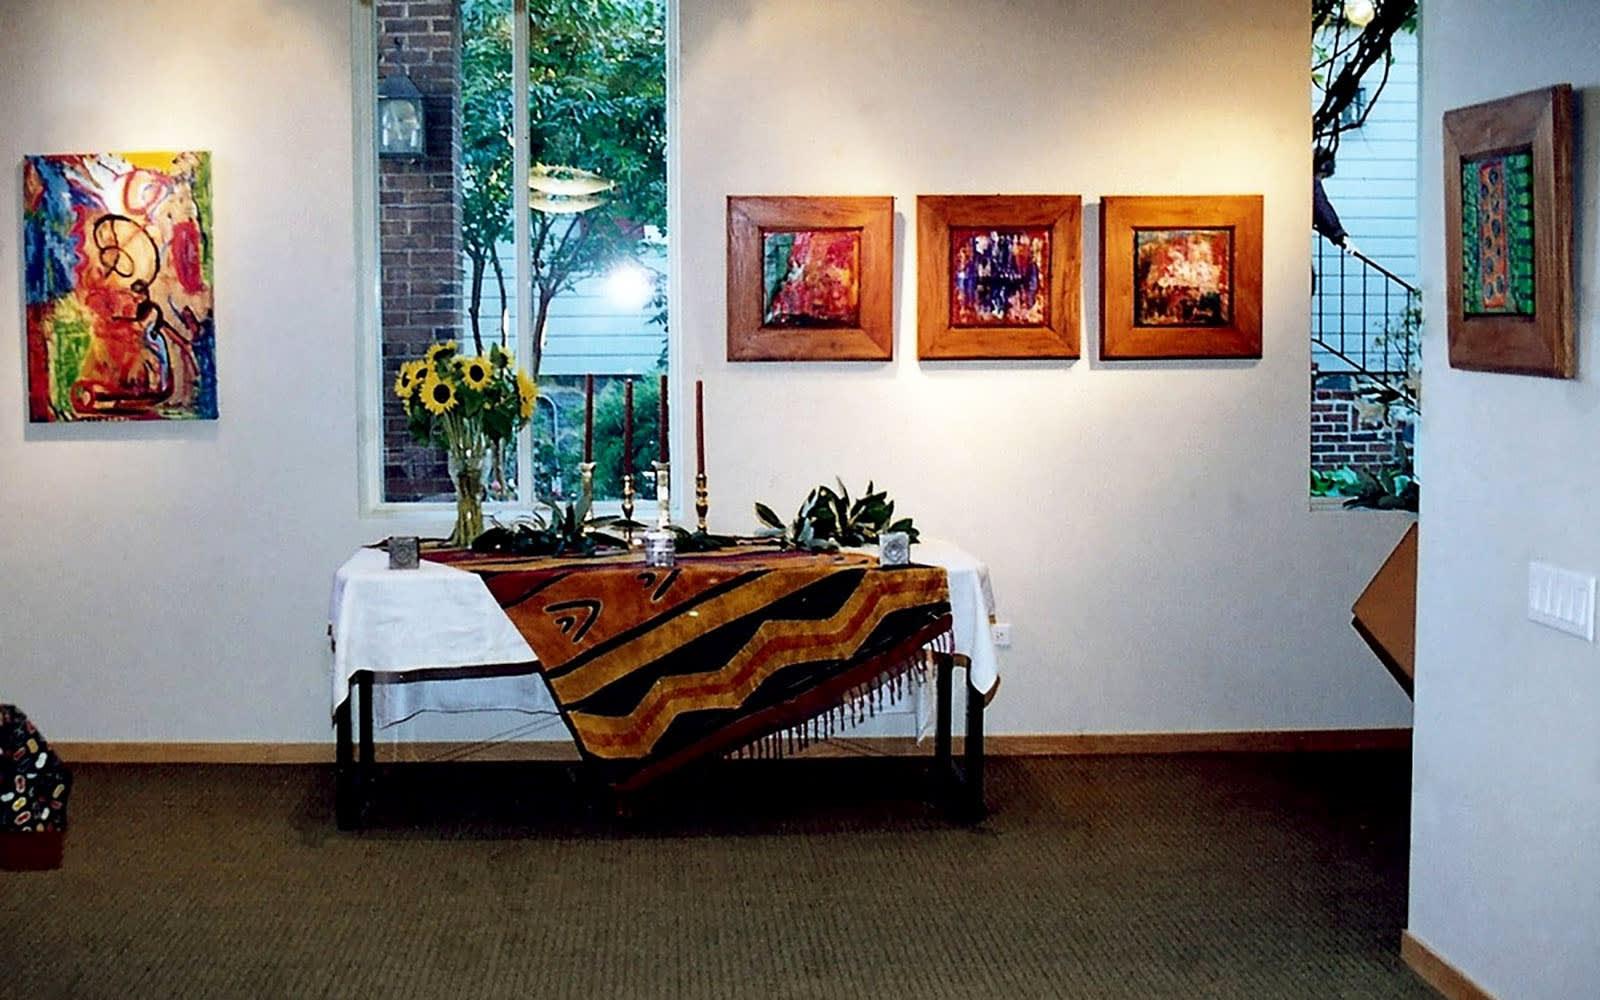 Installation shots courtesy of Bomani Gallery